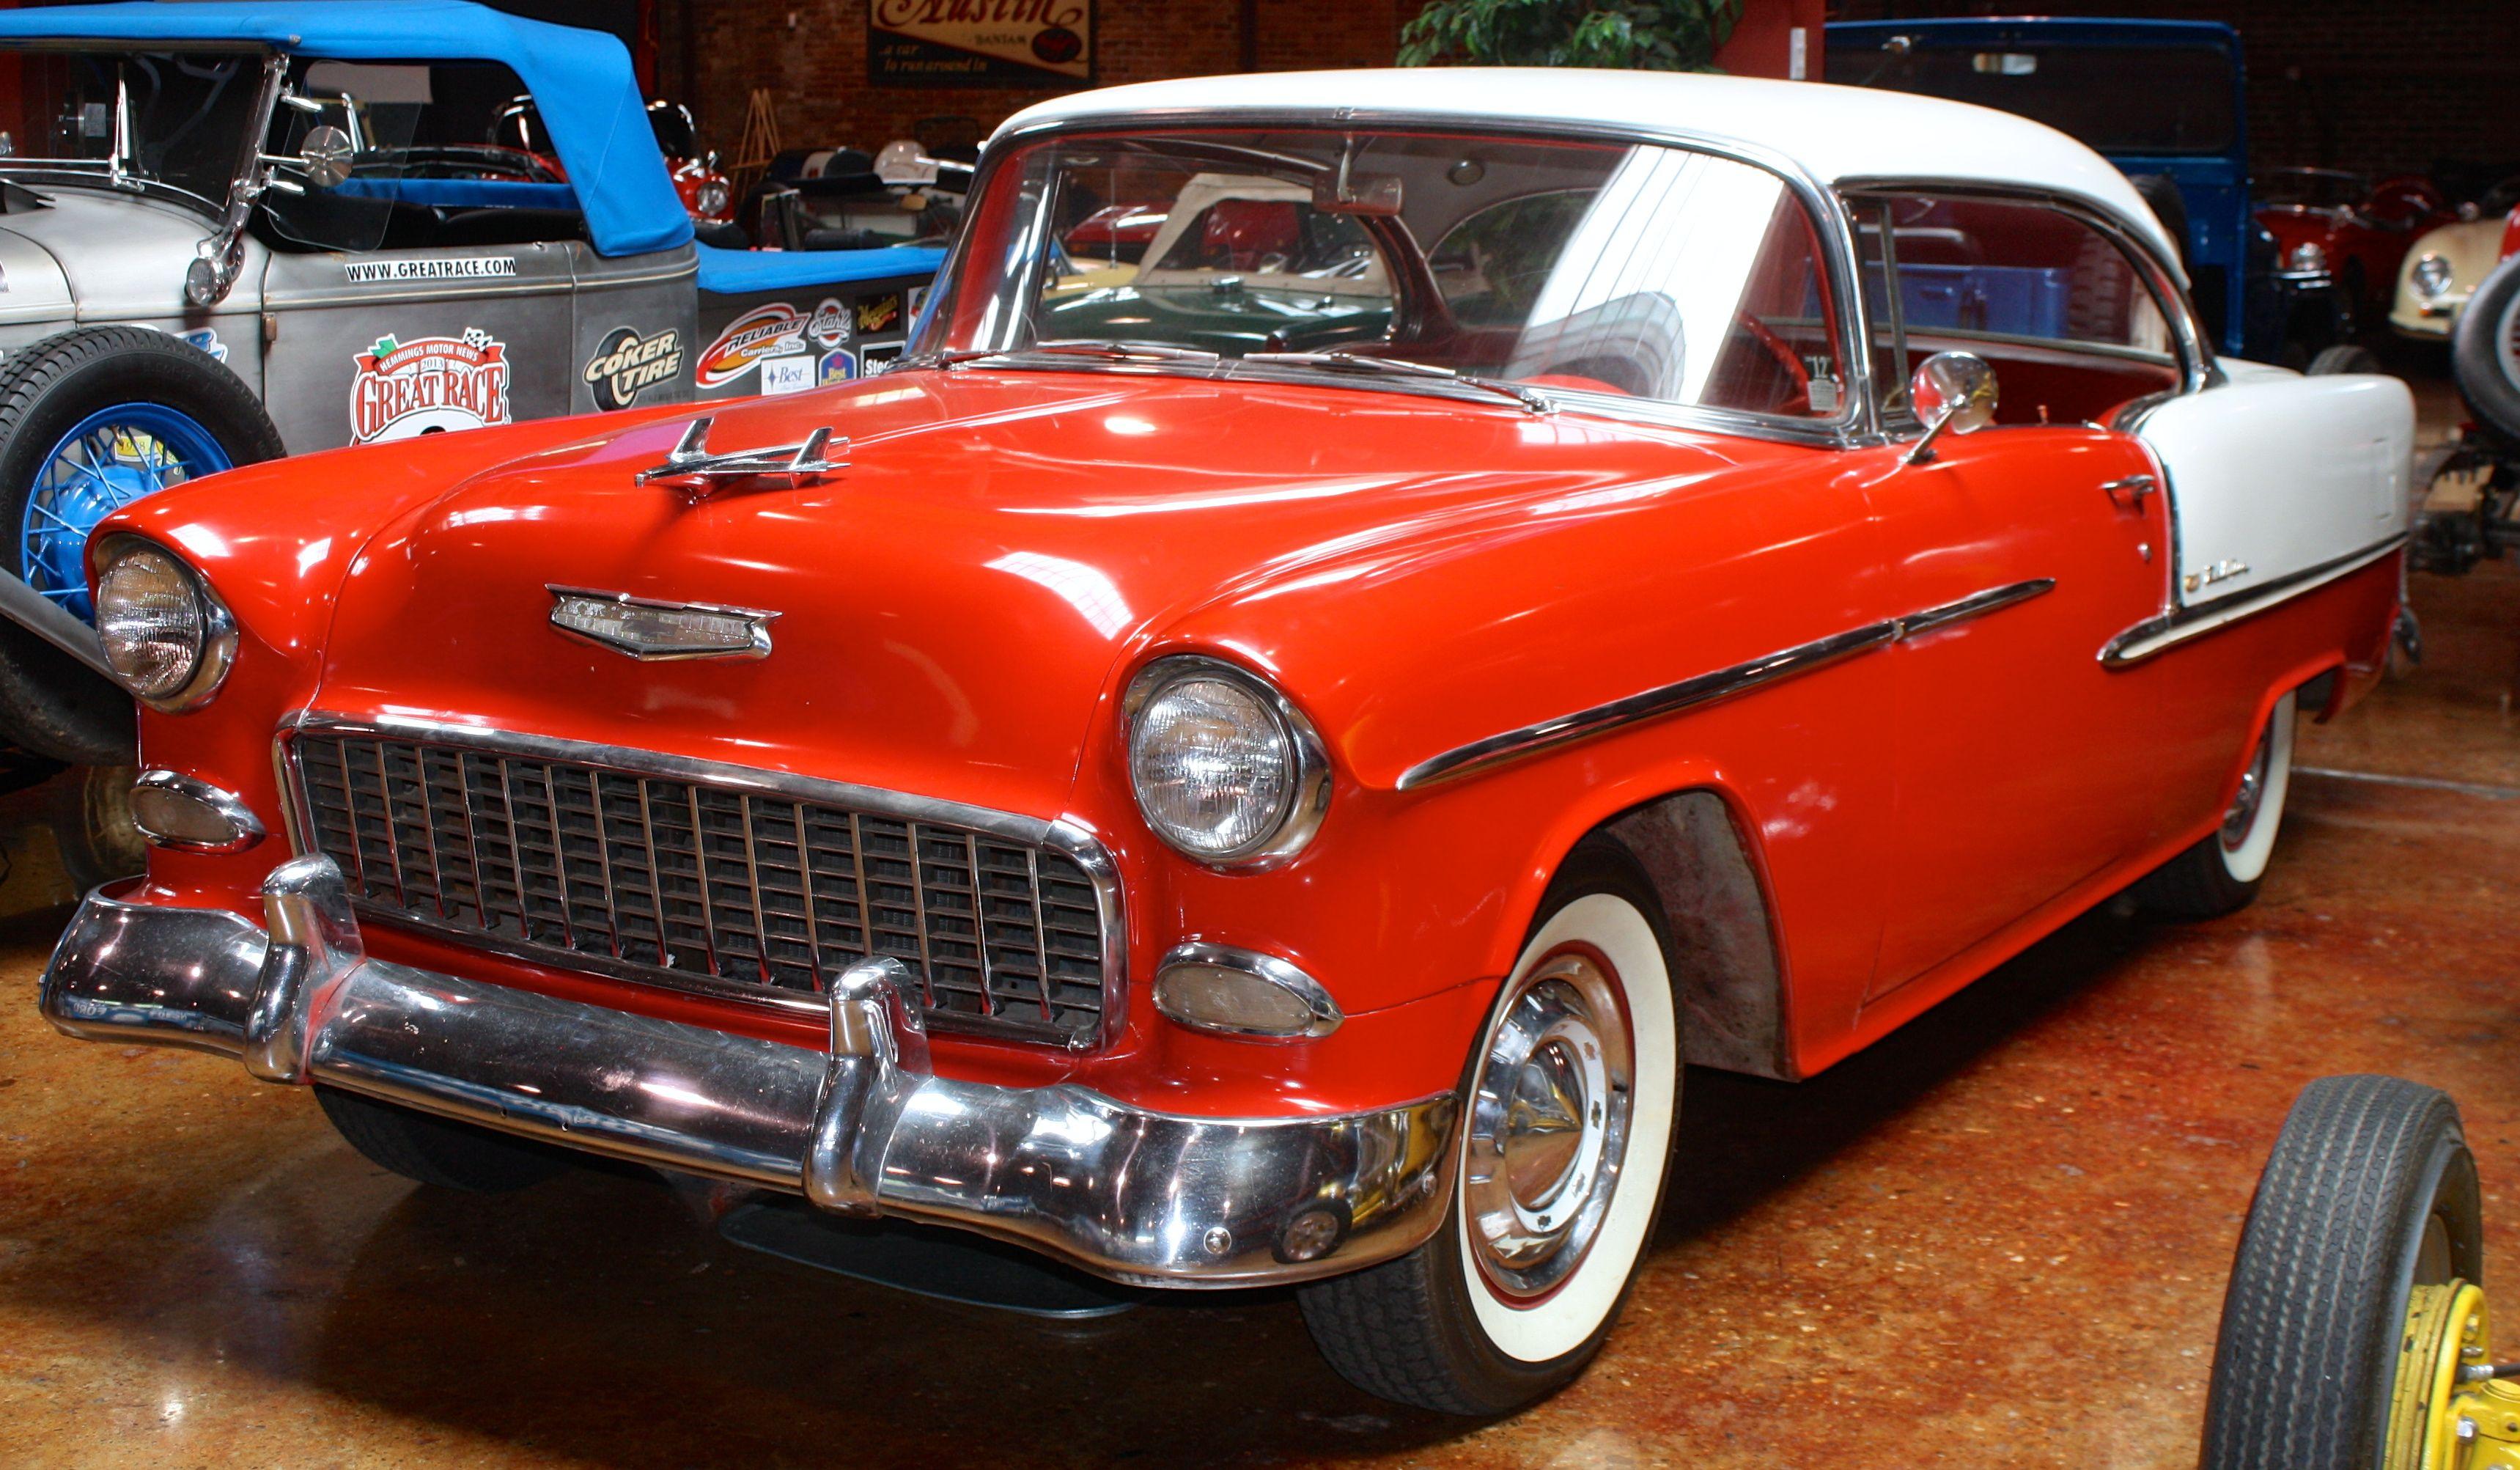 1955 Chevrolet Bel Air 1955 chevrolet, 55 chevy, Chevrolet